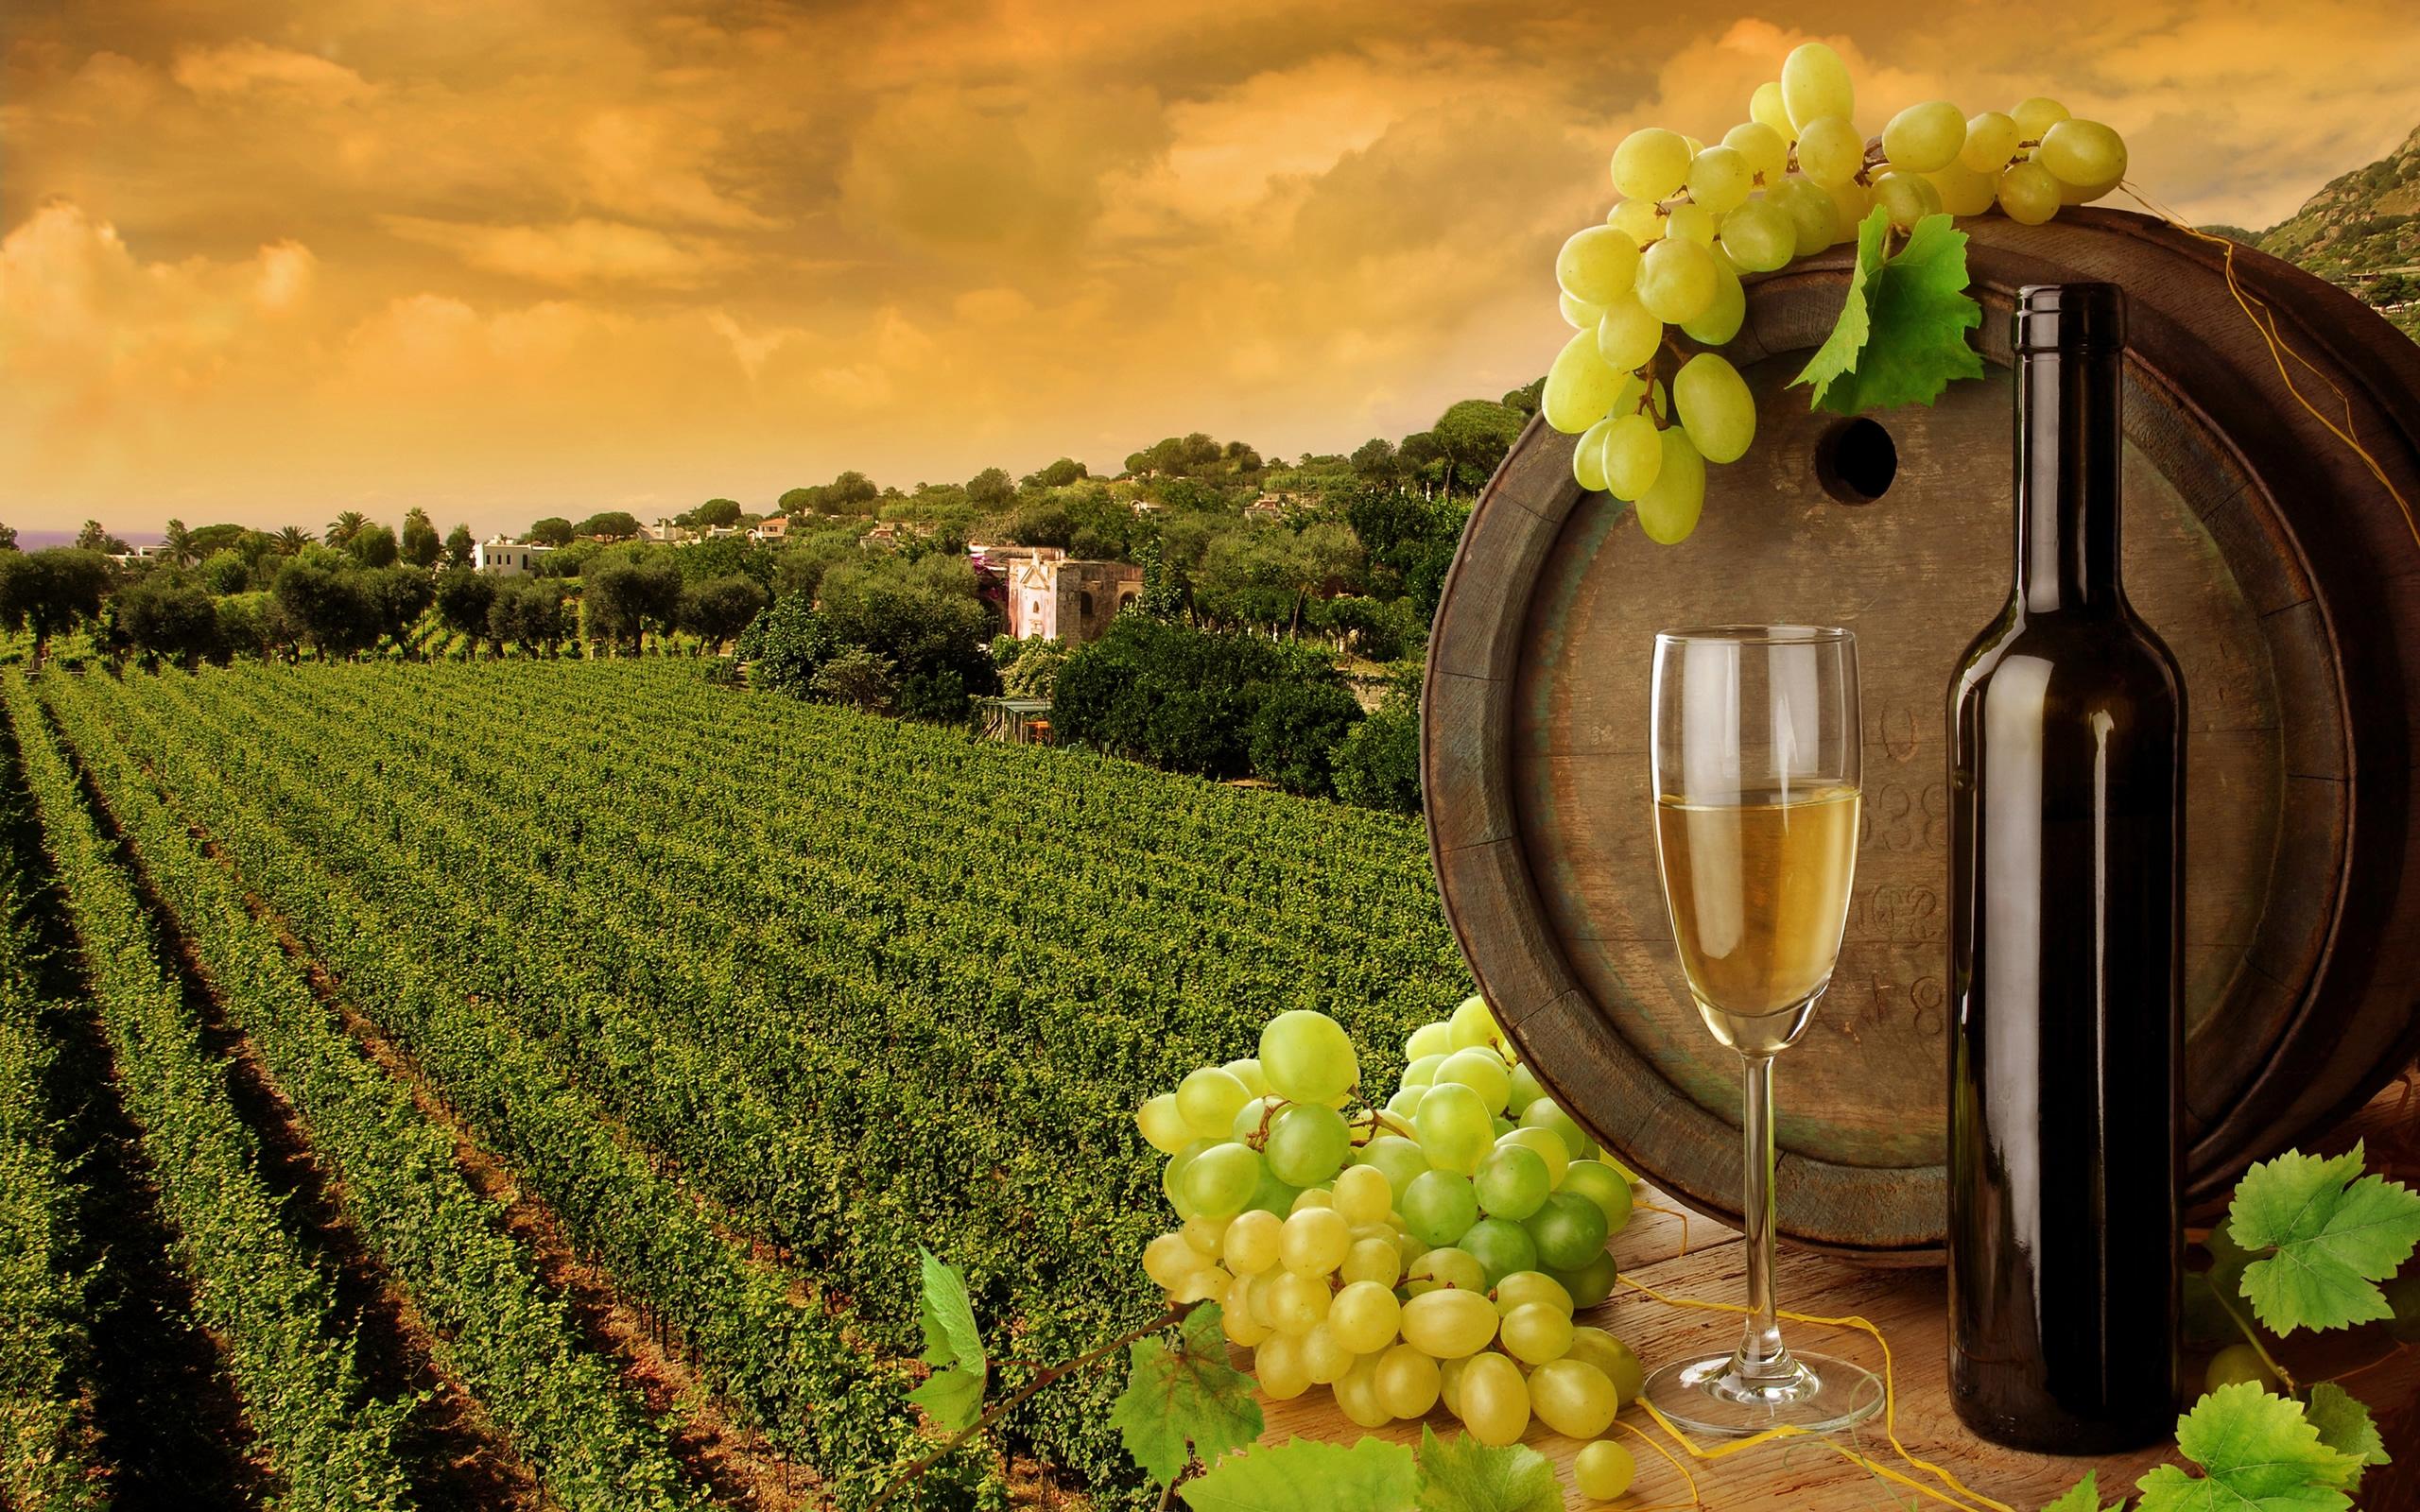 поле, бочка вина, пейзаж, вино, виноград, скачать фото